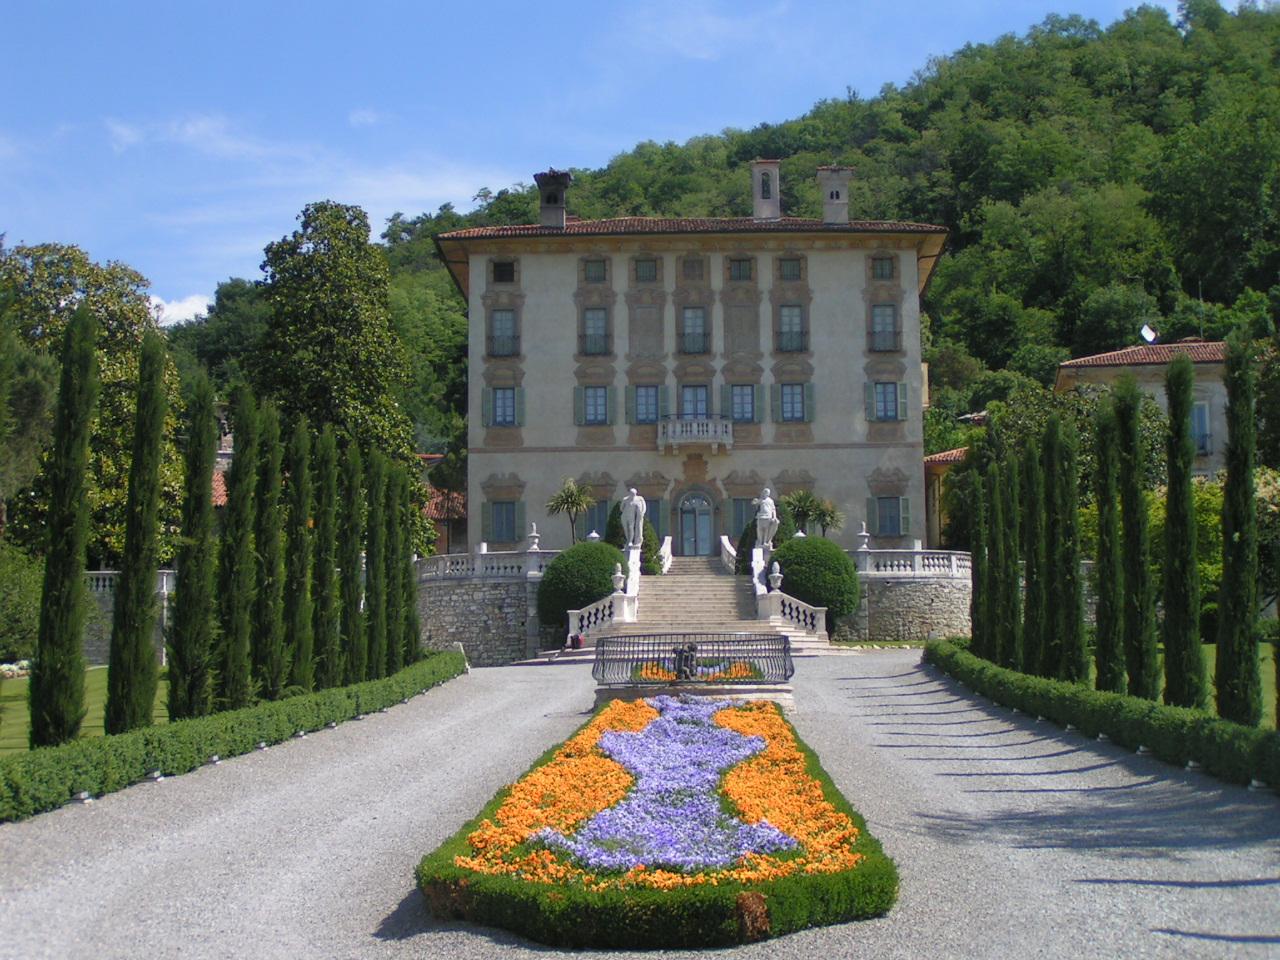 Trescore Balneario Italy  City pictures : Villa Terzi Trescore Balneario Italia